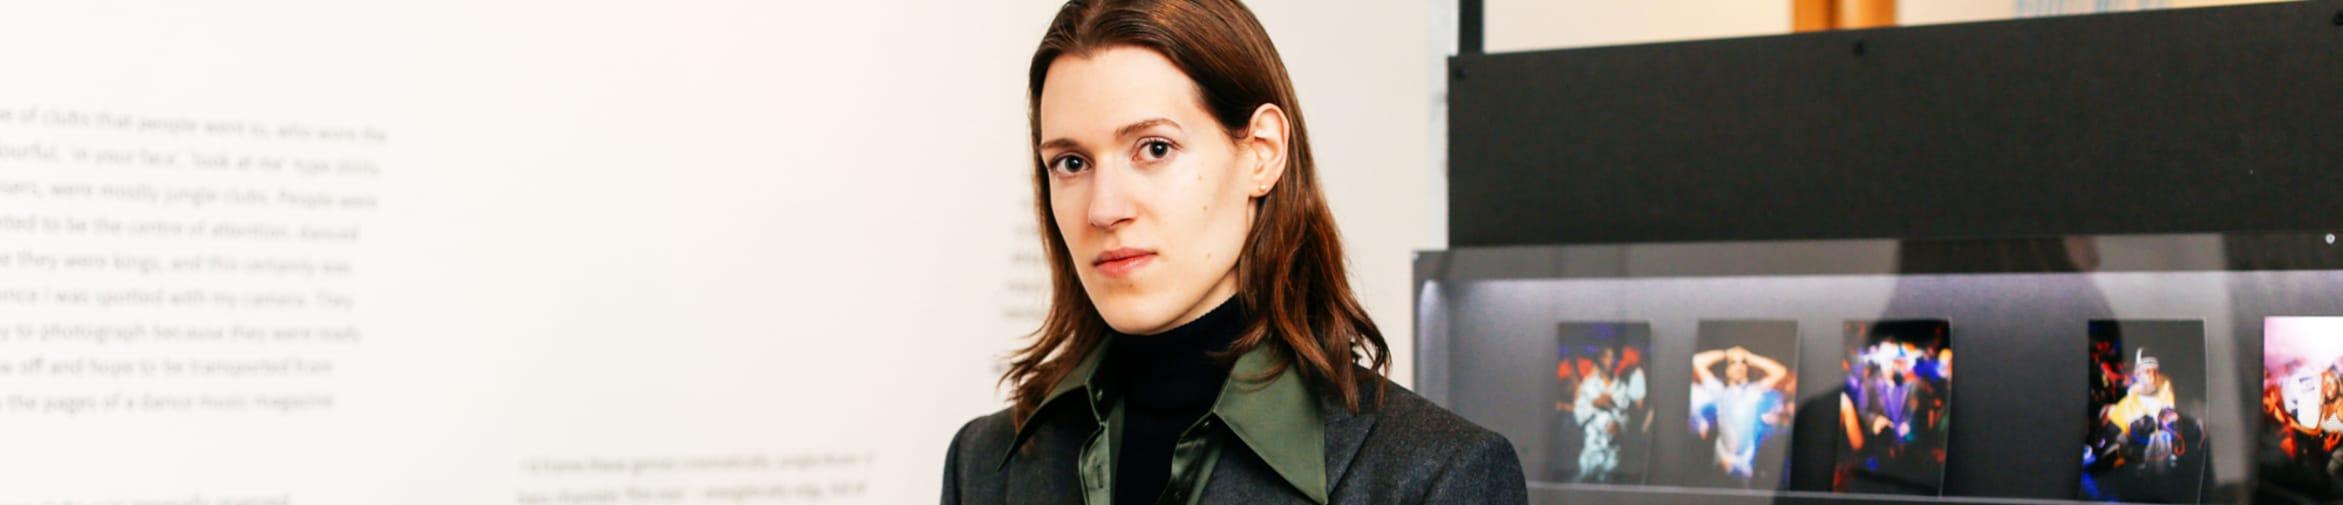 Michele Fornera headshot